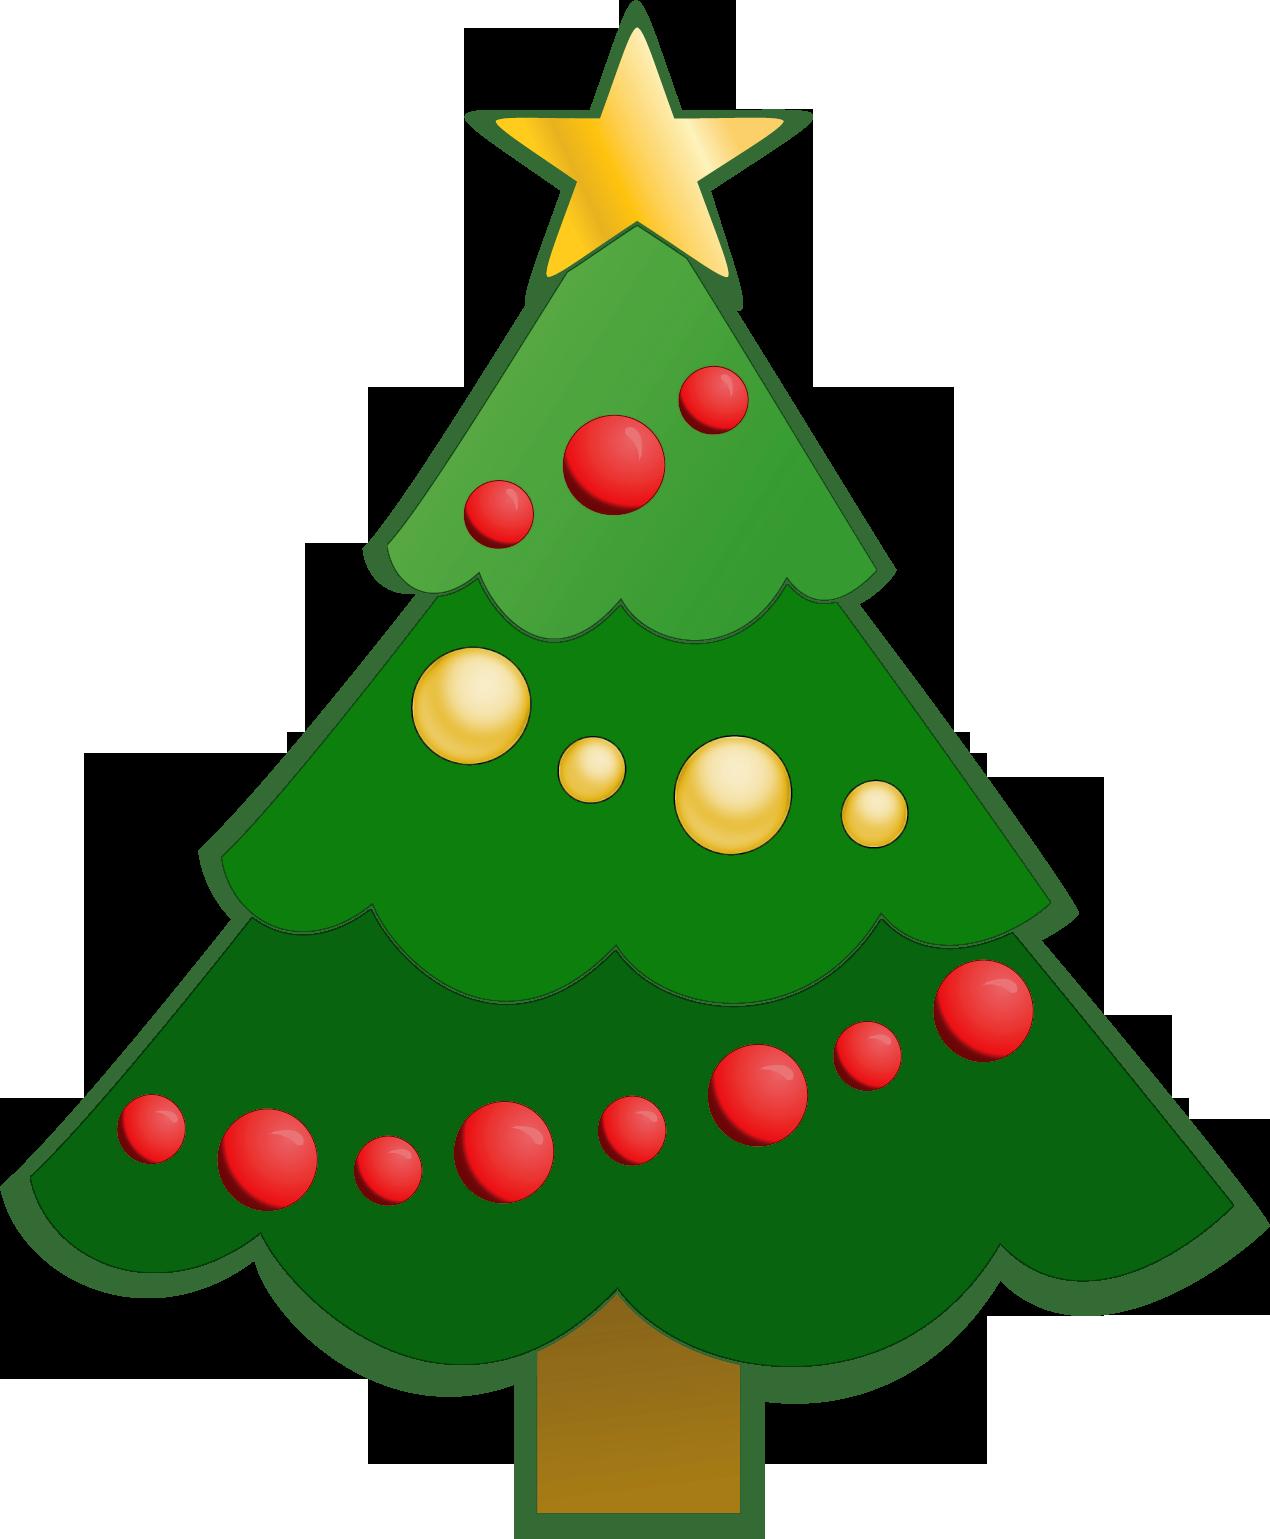 Christmas Tree clipart simple Free Simple Panda Clipart simple%20christmas%20tree%20clipart